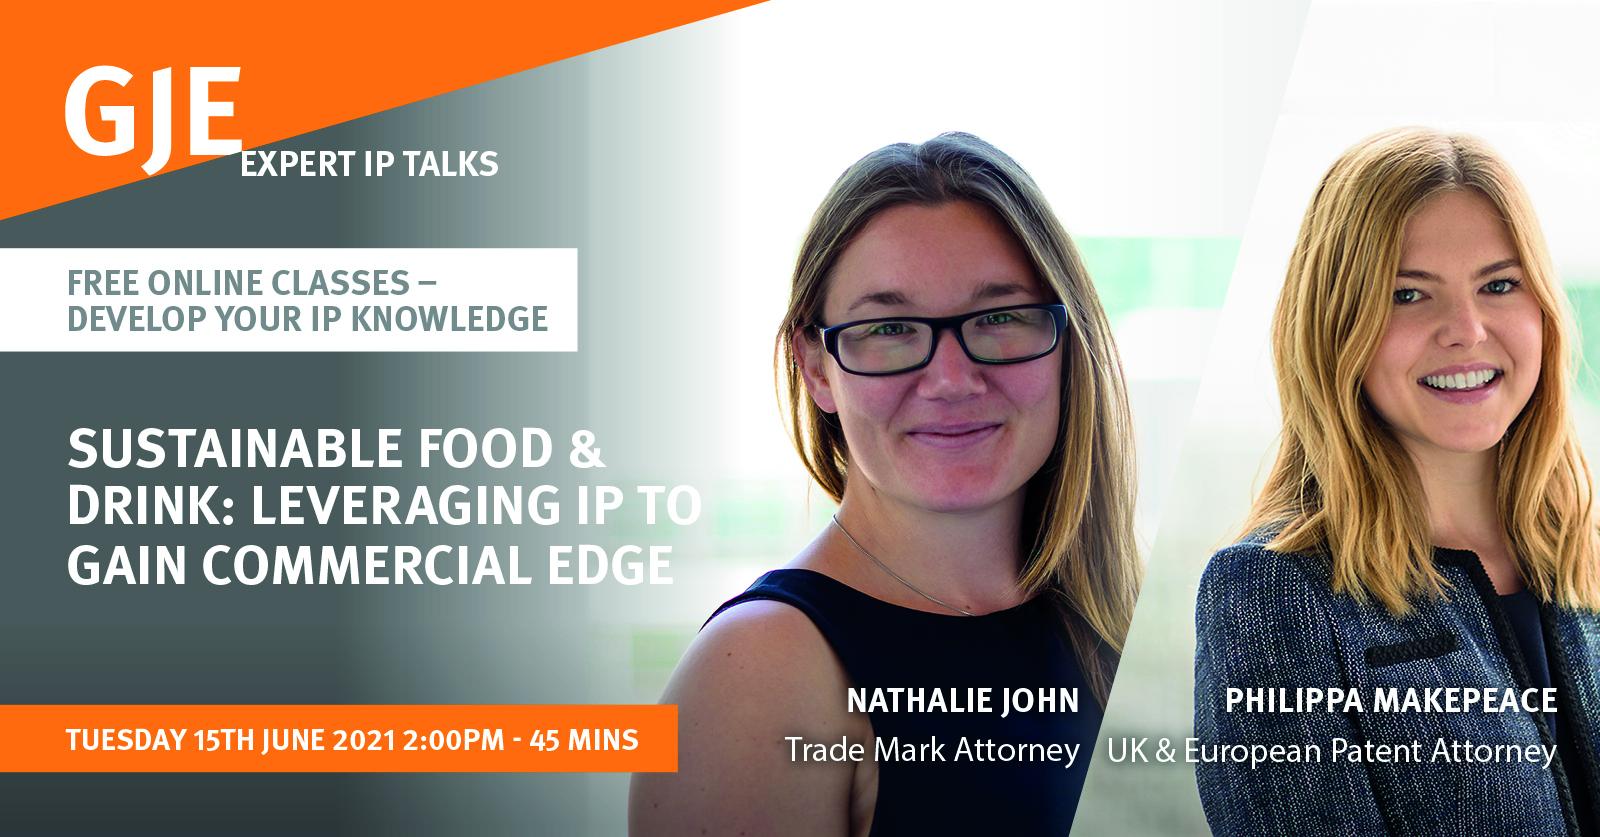 Expert IP Talks LinkedIn Graphic – Nat and Philippa